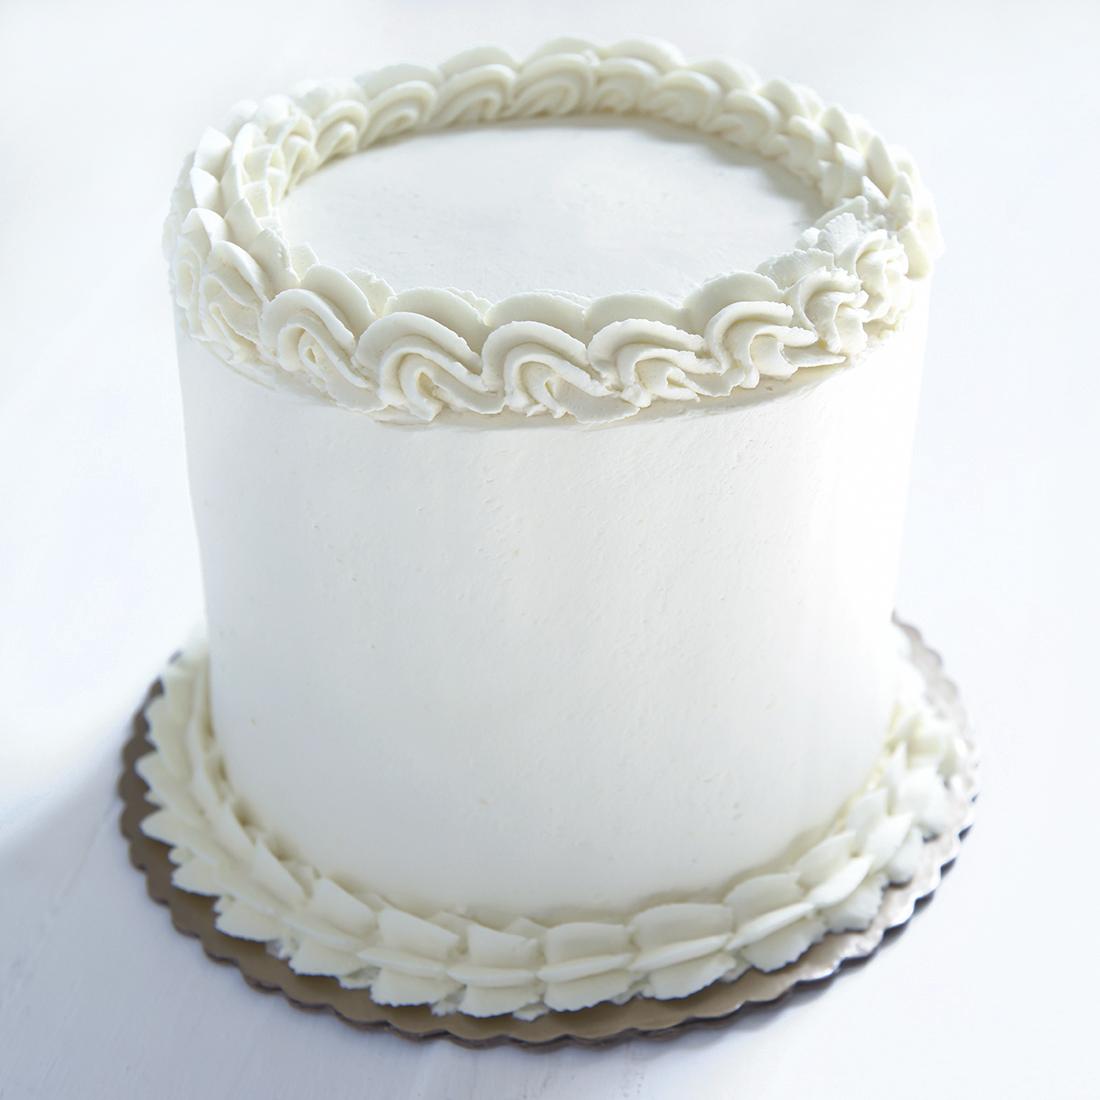 Boston Cream - Vanilla cake layered with chocolate ganache and vanilla pudding, vanilla buttercream frosting6